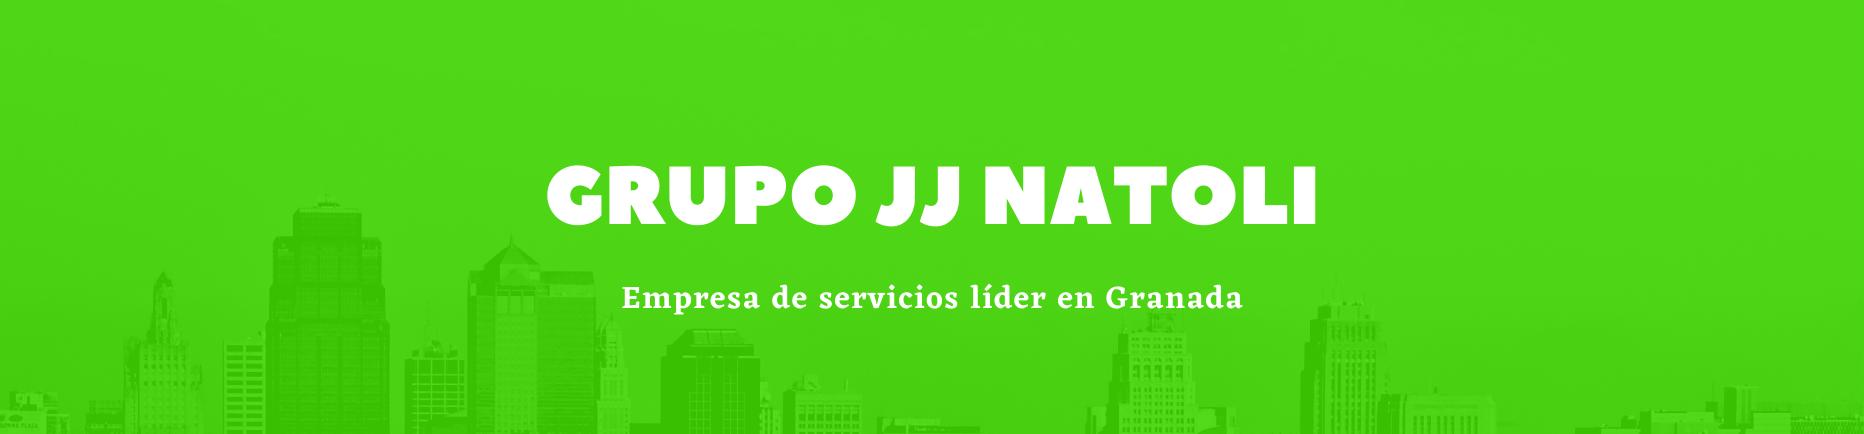 Grupo JJ Natoli (3).png